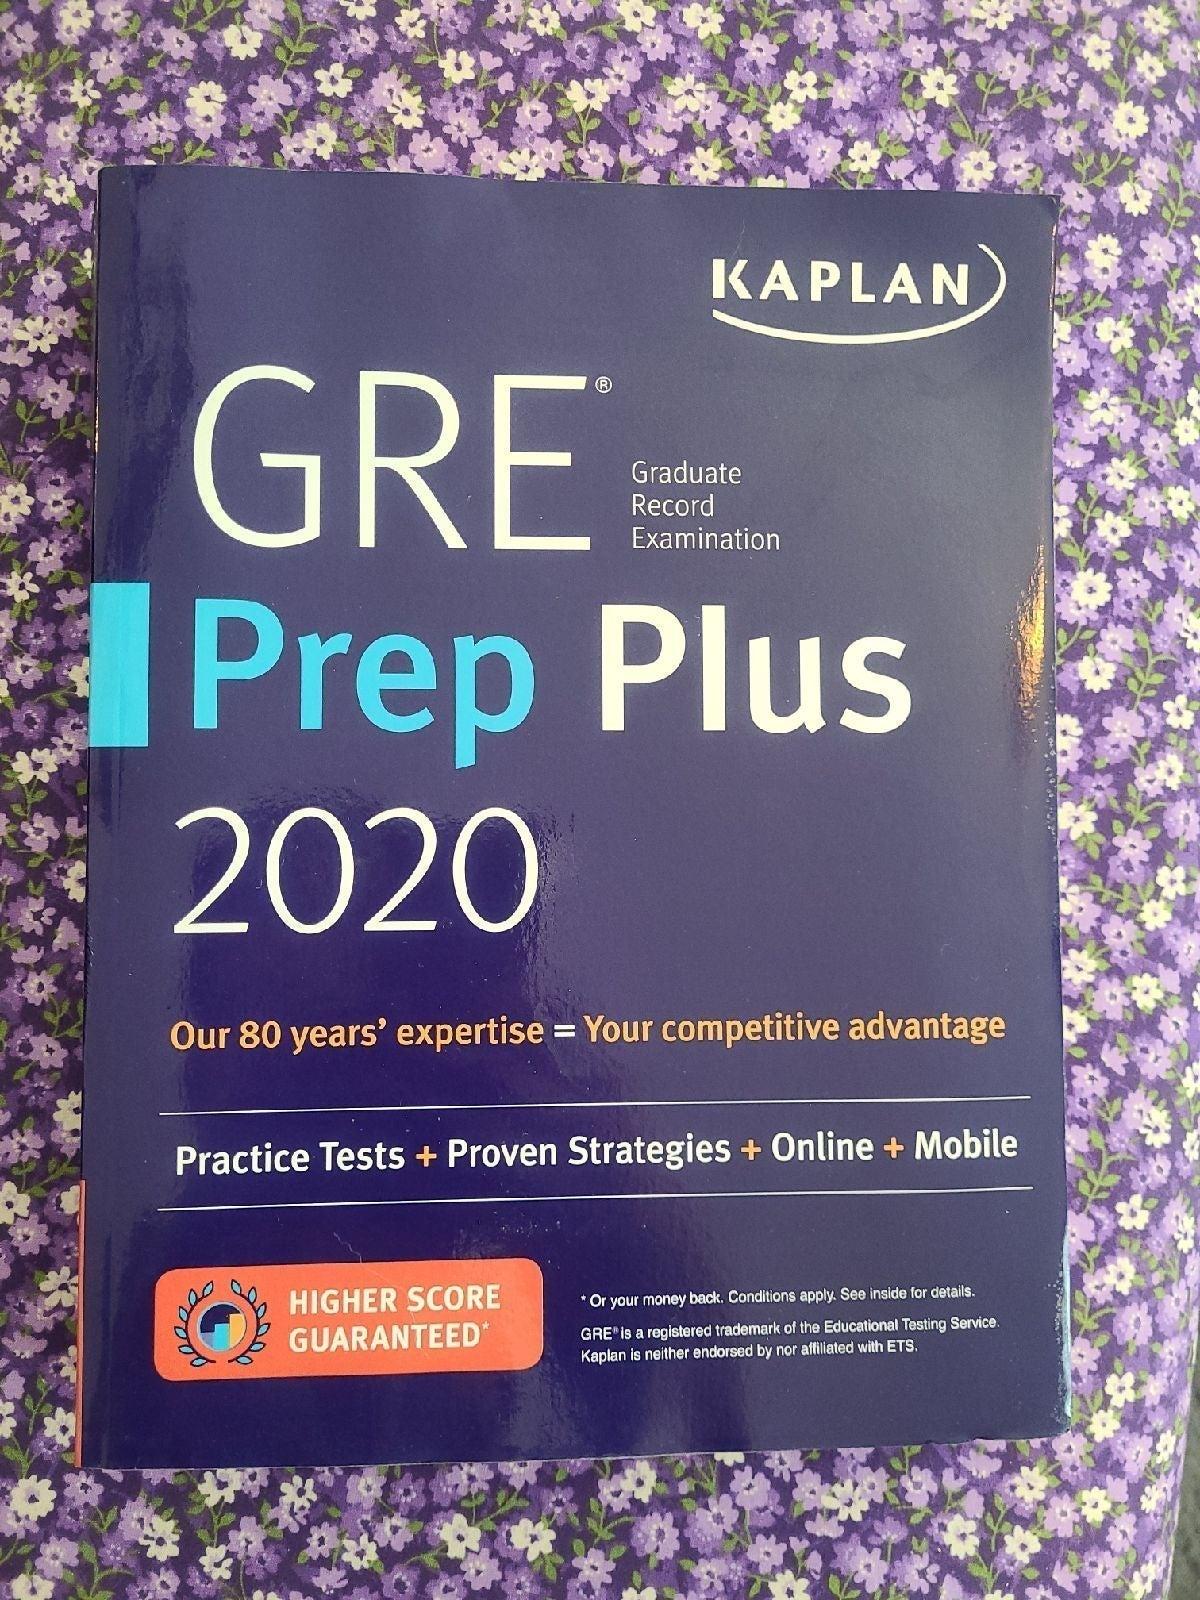 Kaplan GRE Prep Plus 2020 (Brand New)